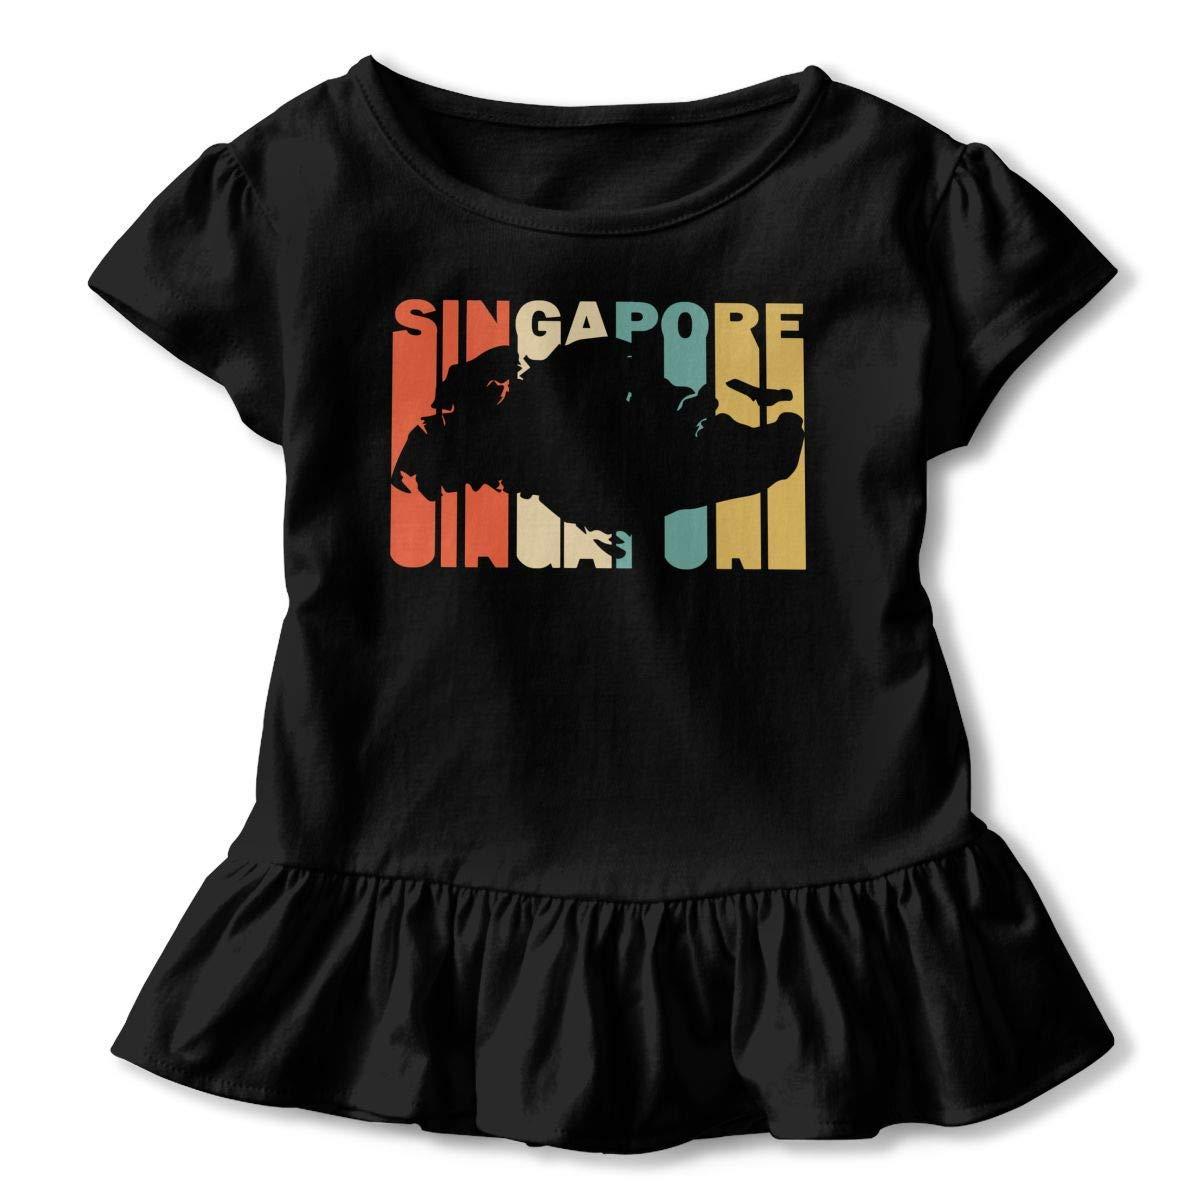 2-6T Short Sleeve Retro Style Singapore Silhouette T-Shirts for Girls Cute Sweatshirt with Falbala